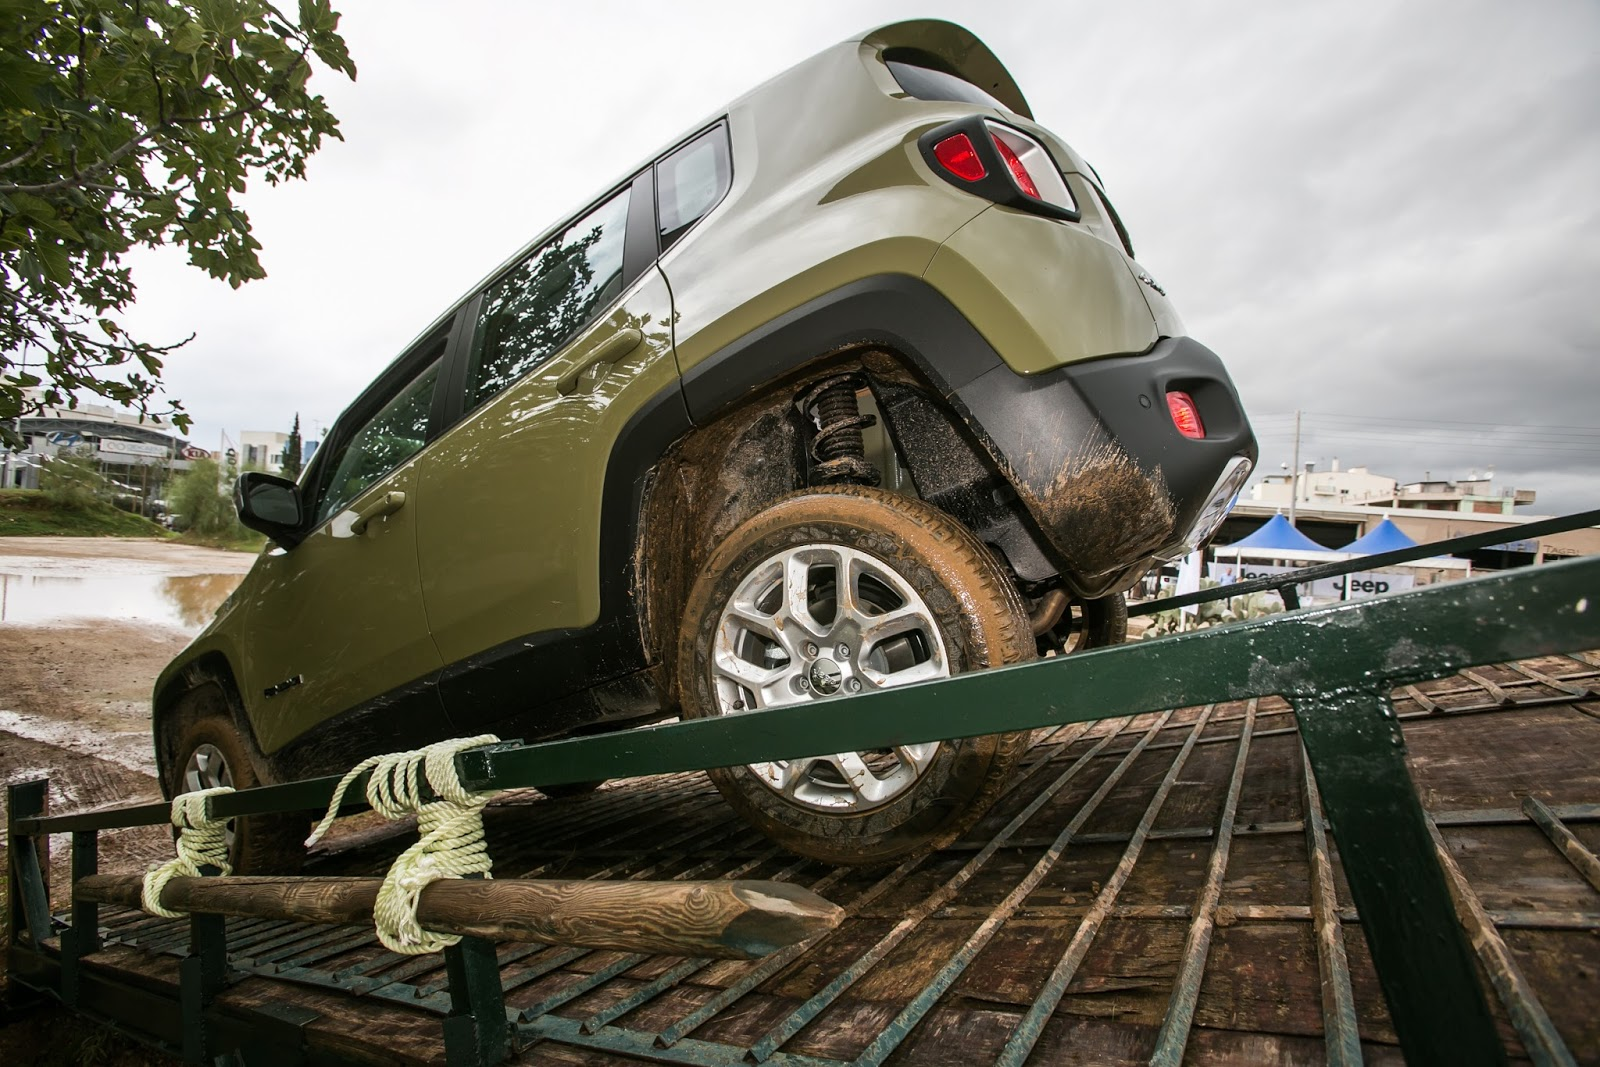 JEEP%2BCAMP GK 0414 Πετάμε ένα Jeep Renegade σε λάσπες, πέτρες, άμμο, λίμνες. Θα τα καταφέρει; Jeep, Jeep Renegade, Renegade, SUV, TEST, zblog, ΔΟΚΙΜΕΣ